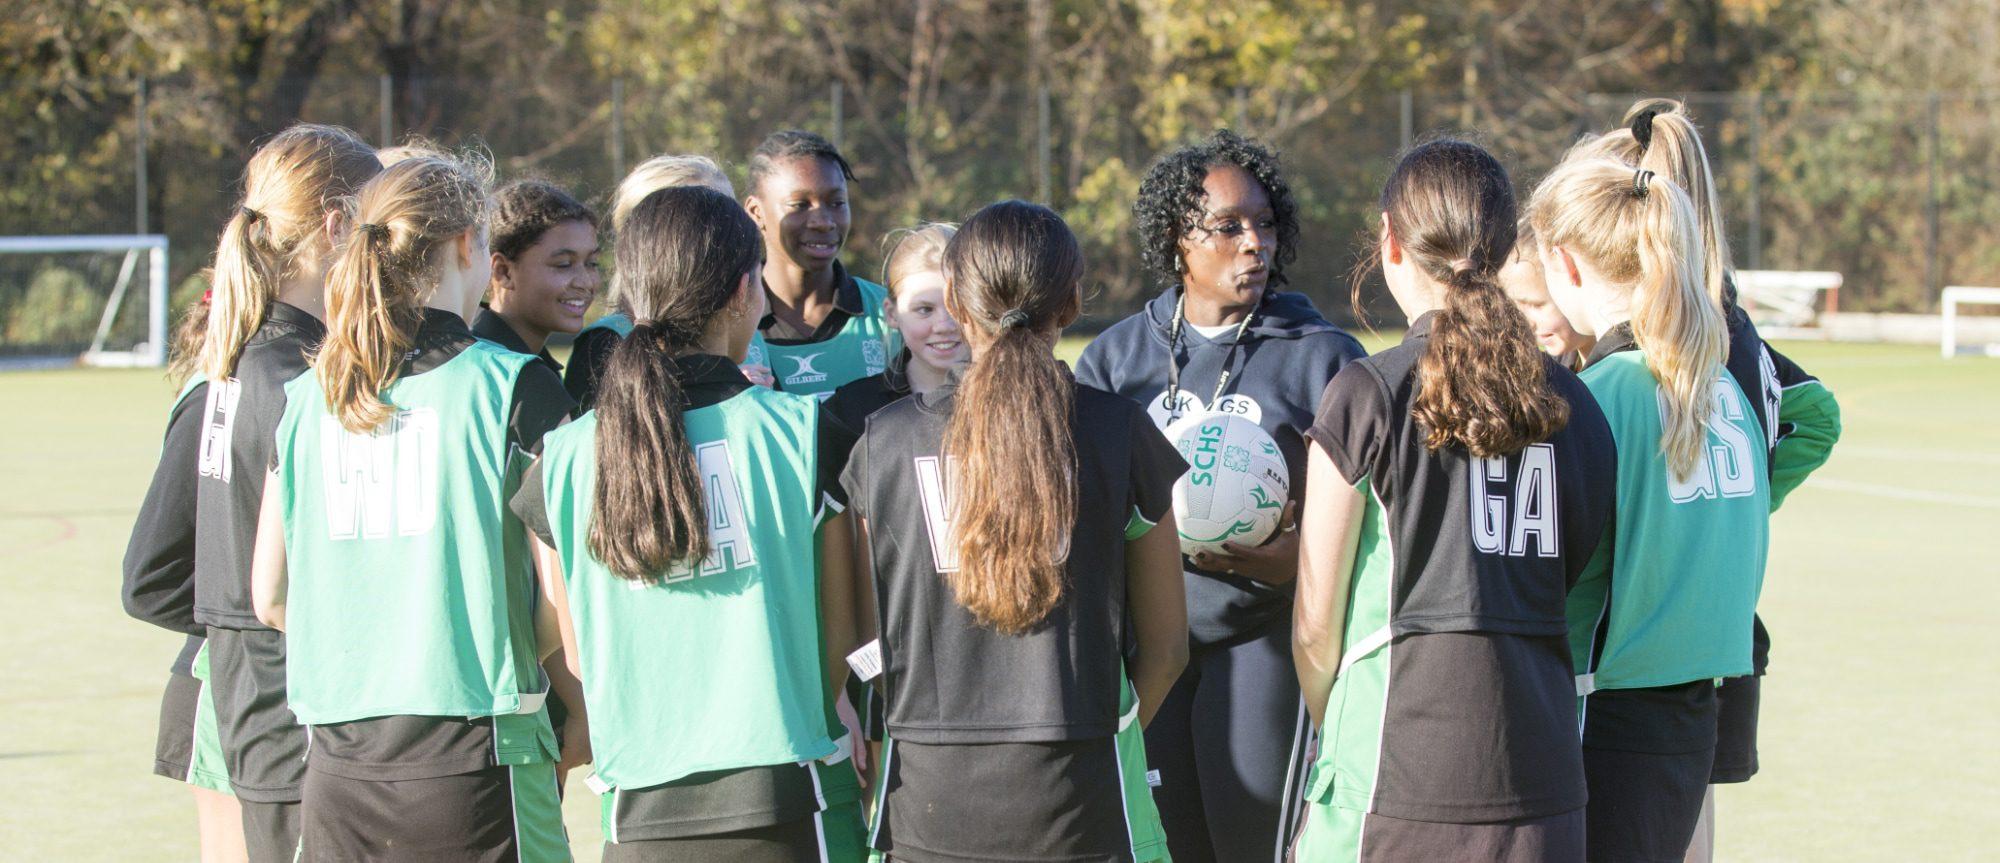 Sports Scholarships | Streatham & Clapham High School